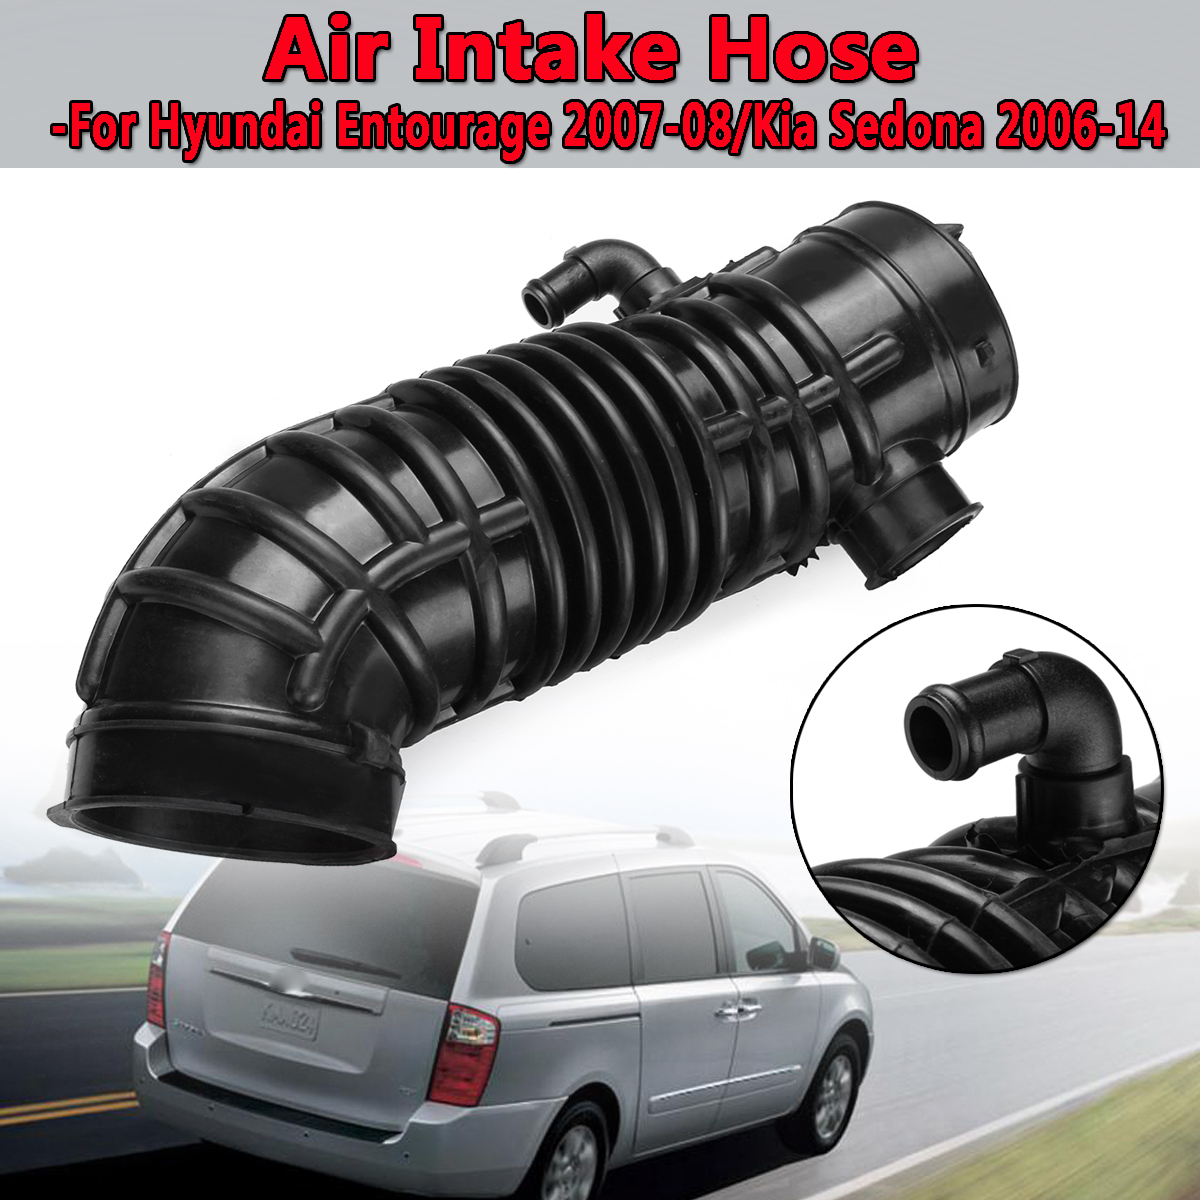 medium resolution of engine car air intake hose pipe for hyundai entourage 2007 2008 for kia sedona 2006